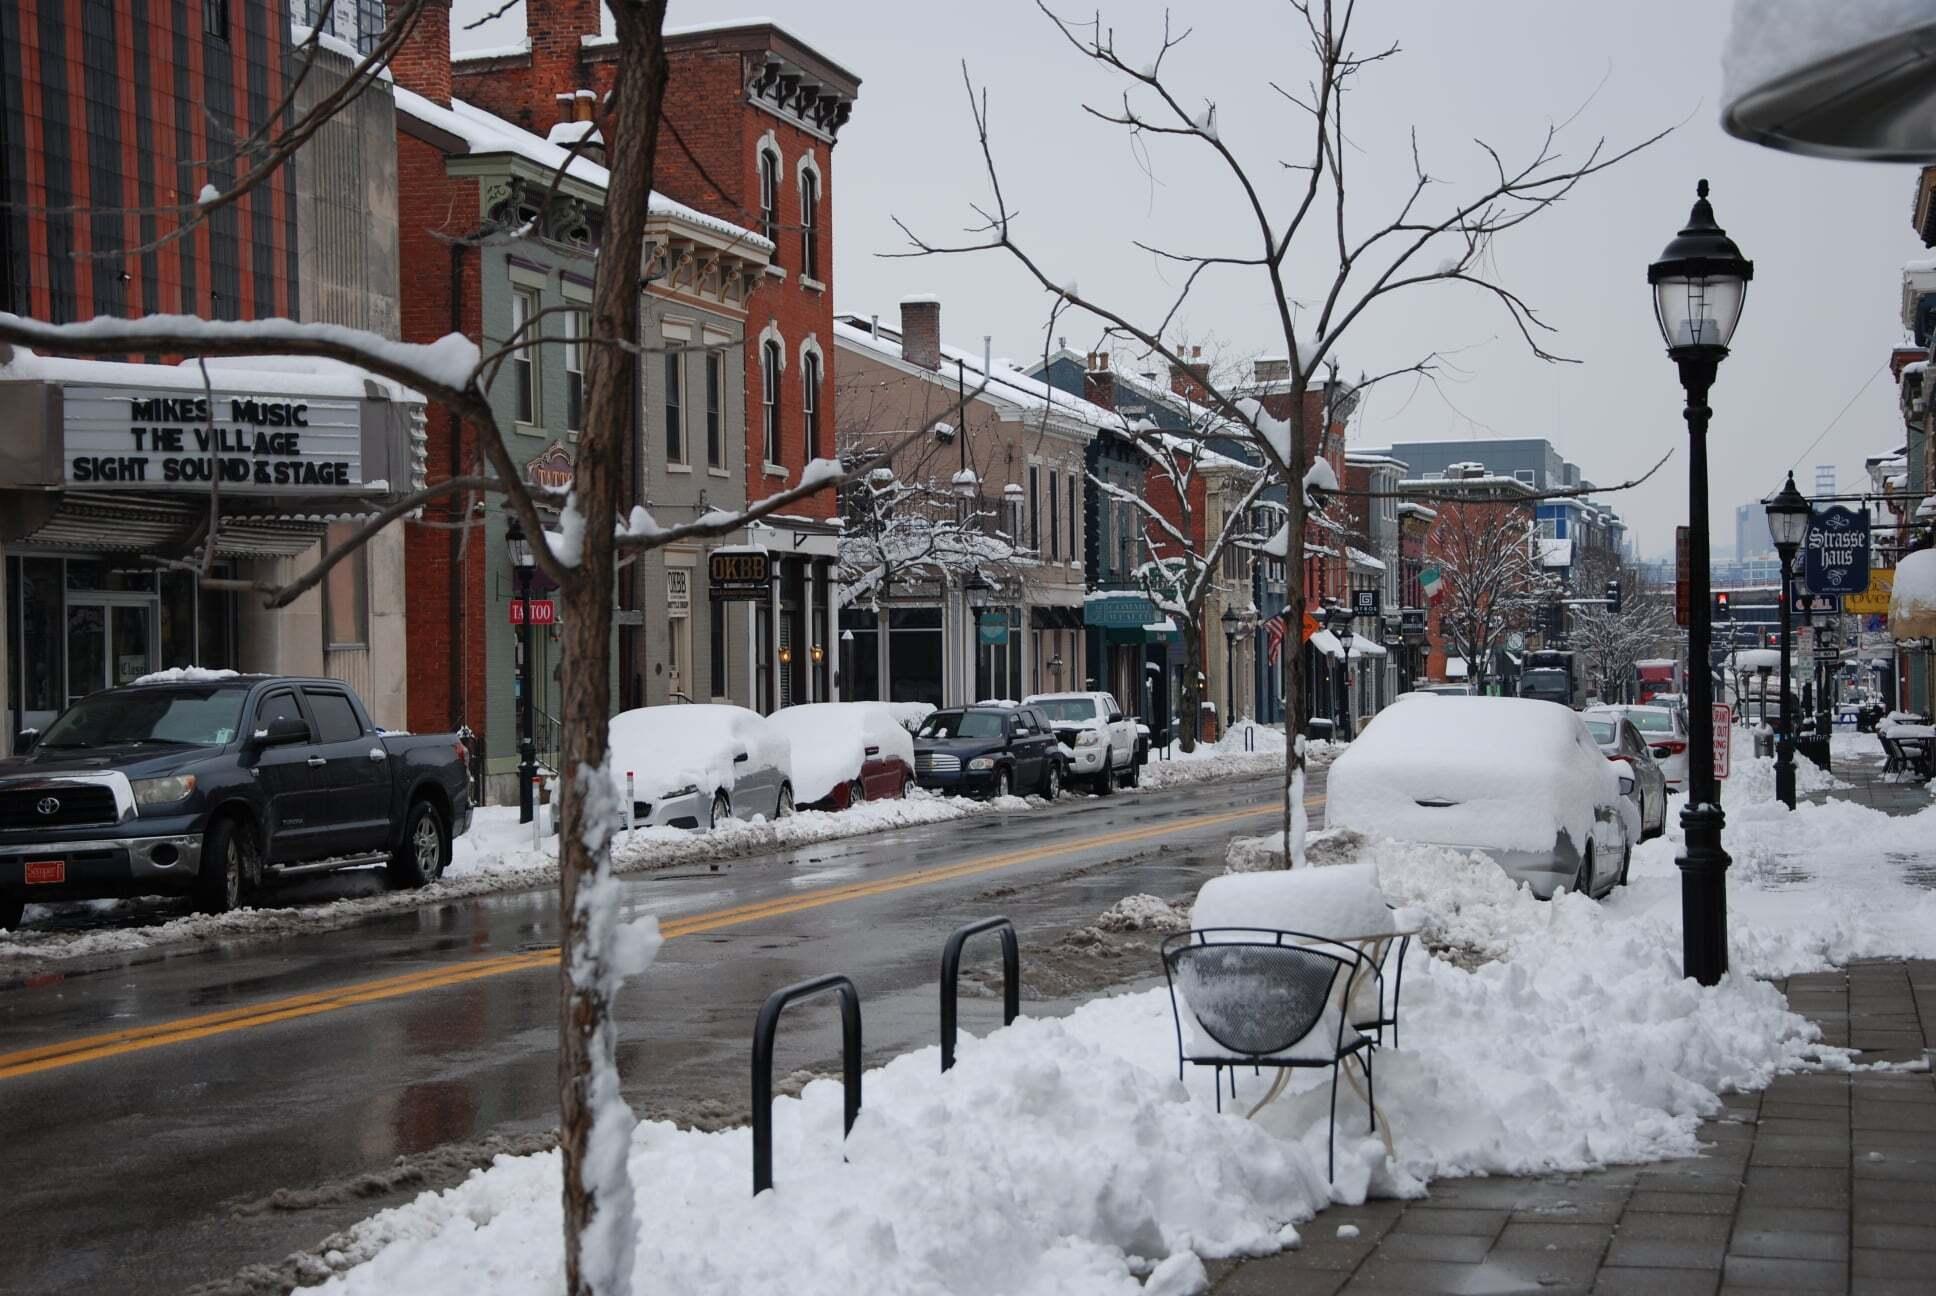 mainstrasse-snow-main-street-angie-coyle.jpg